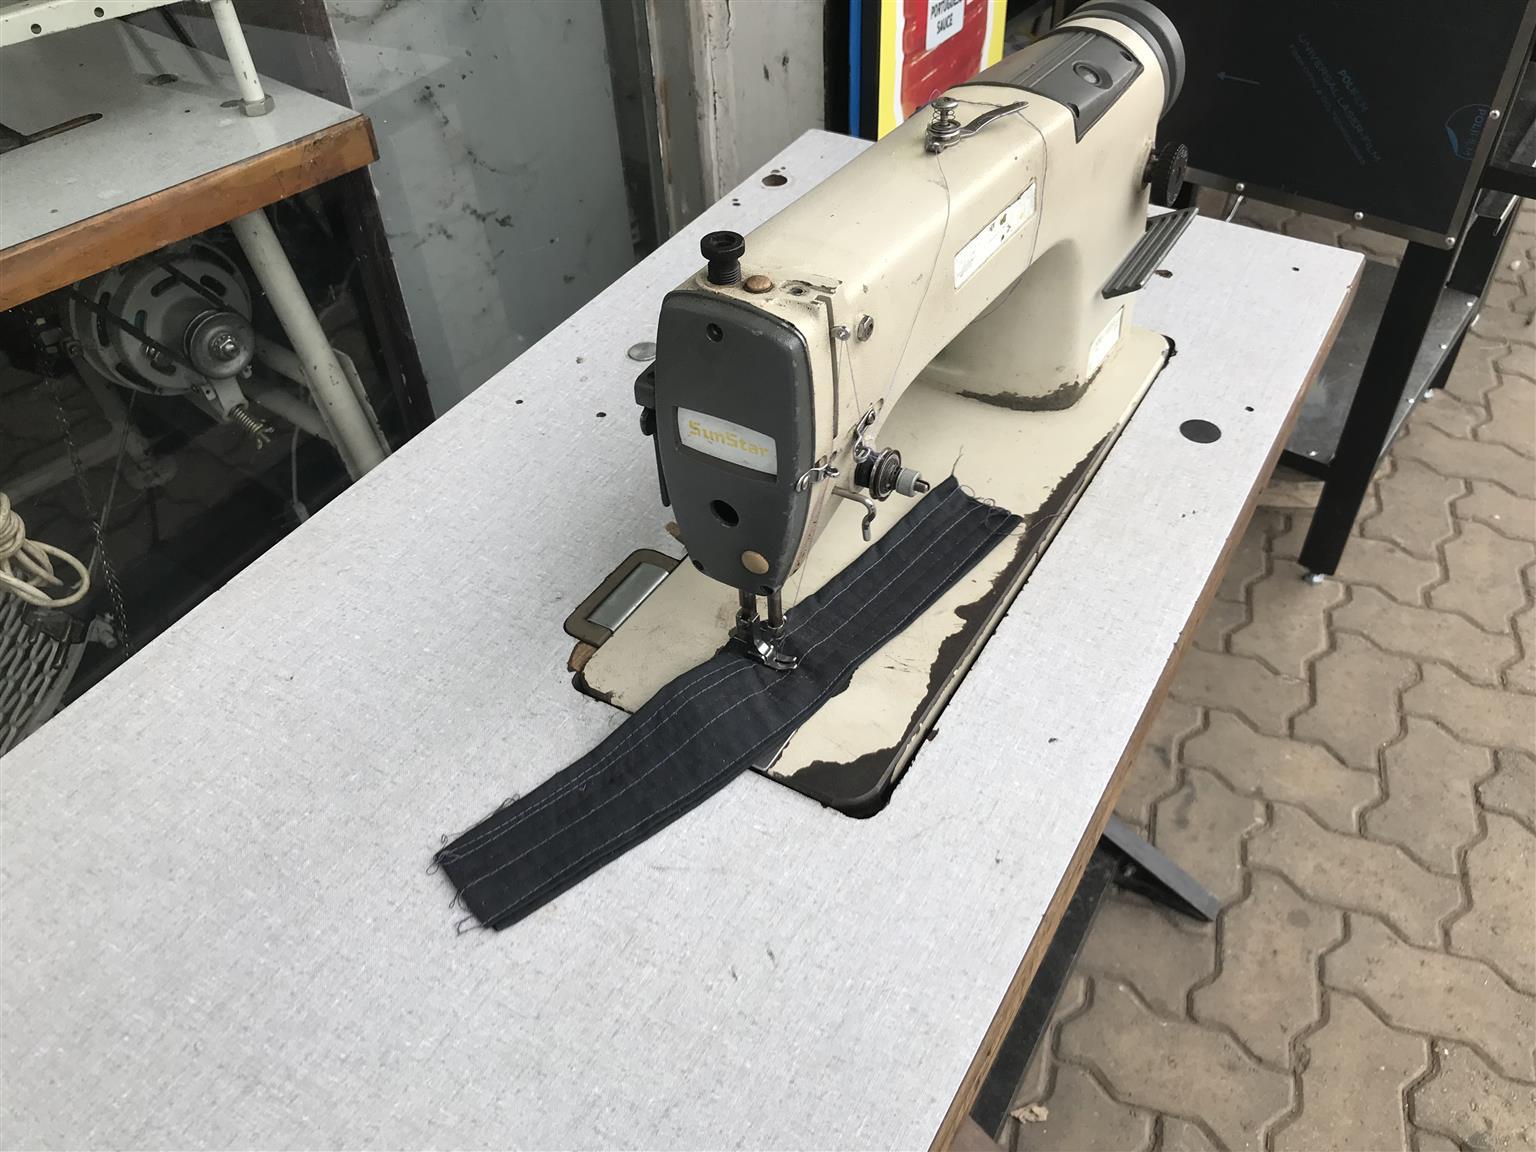 Sunstar industrial sewing machine R3500